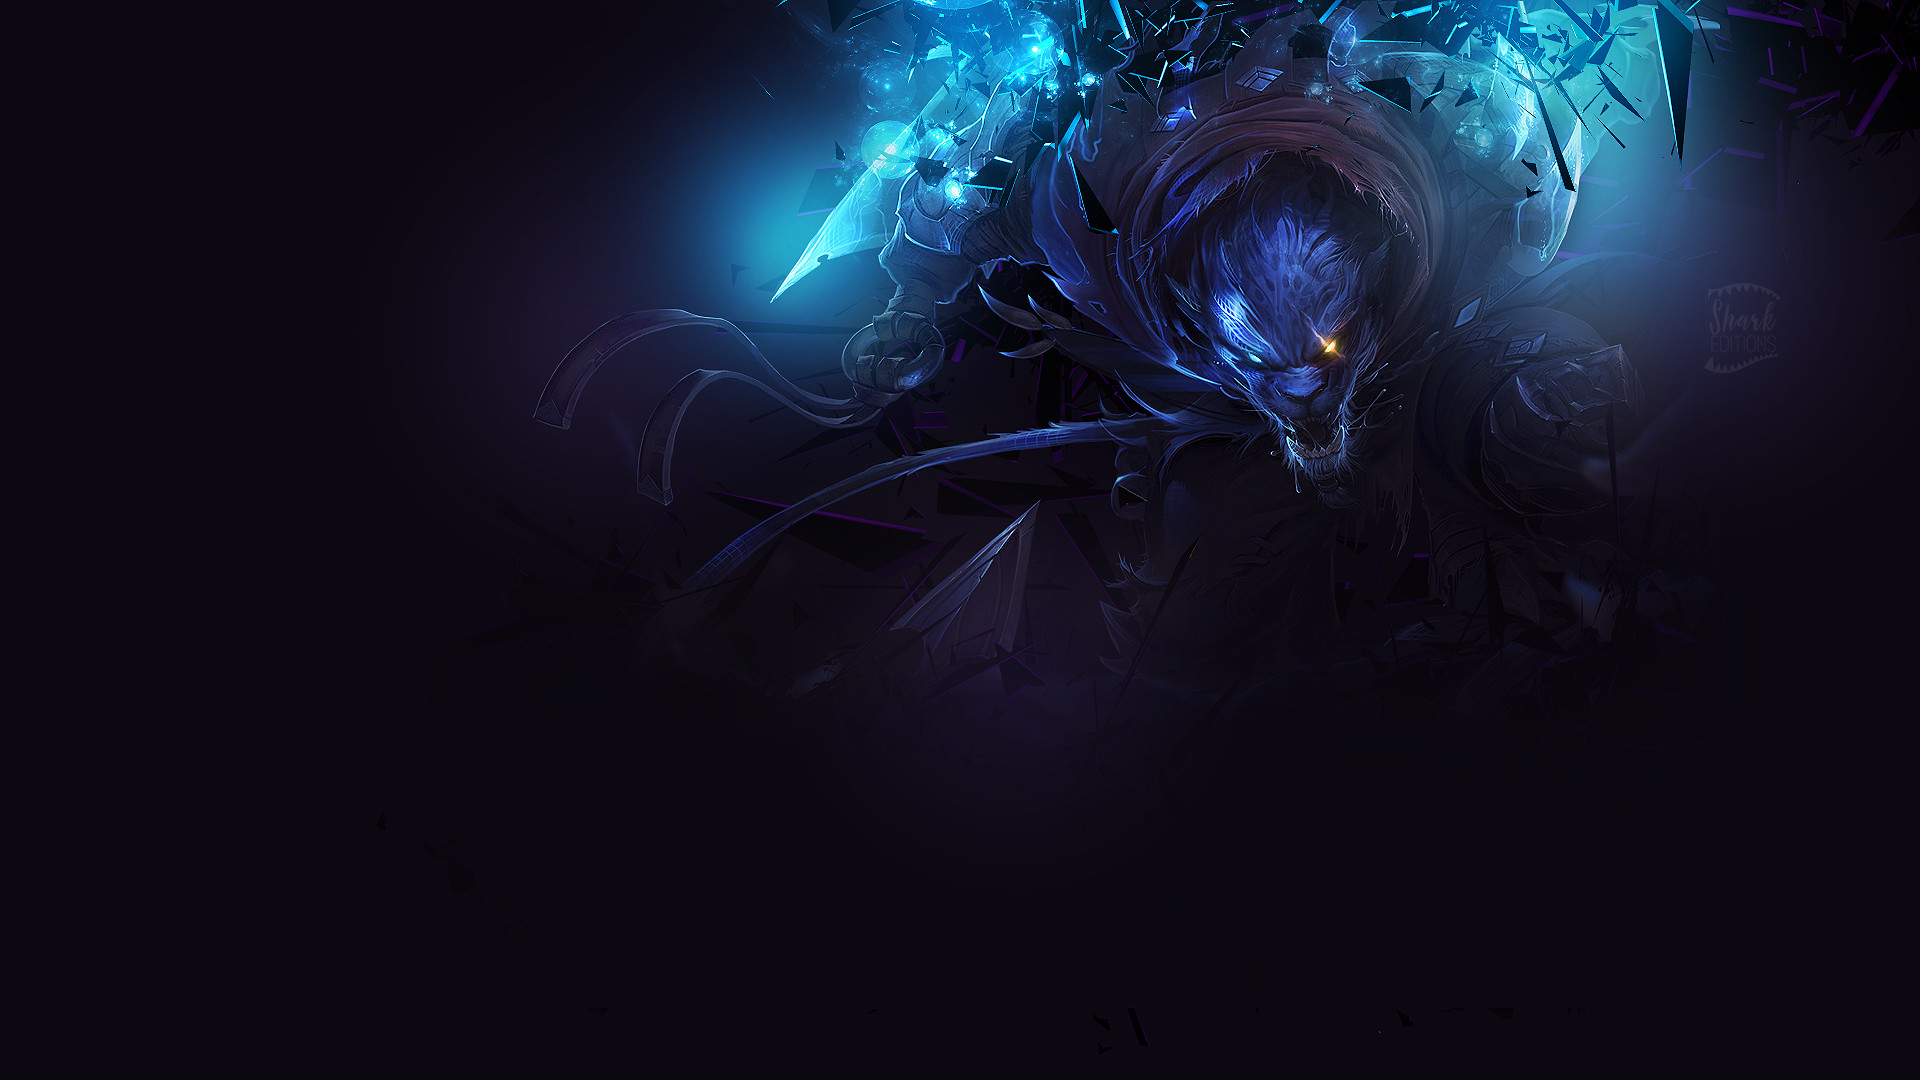 … Rengar wallpaper League of Legends by LeftLucy